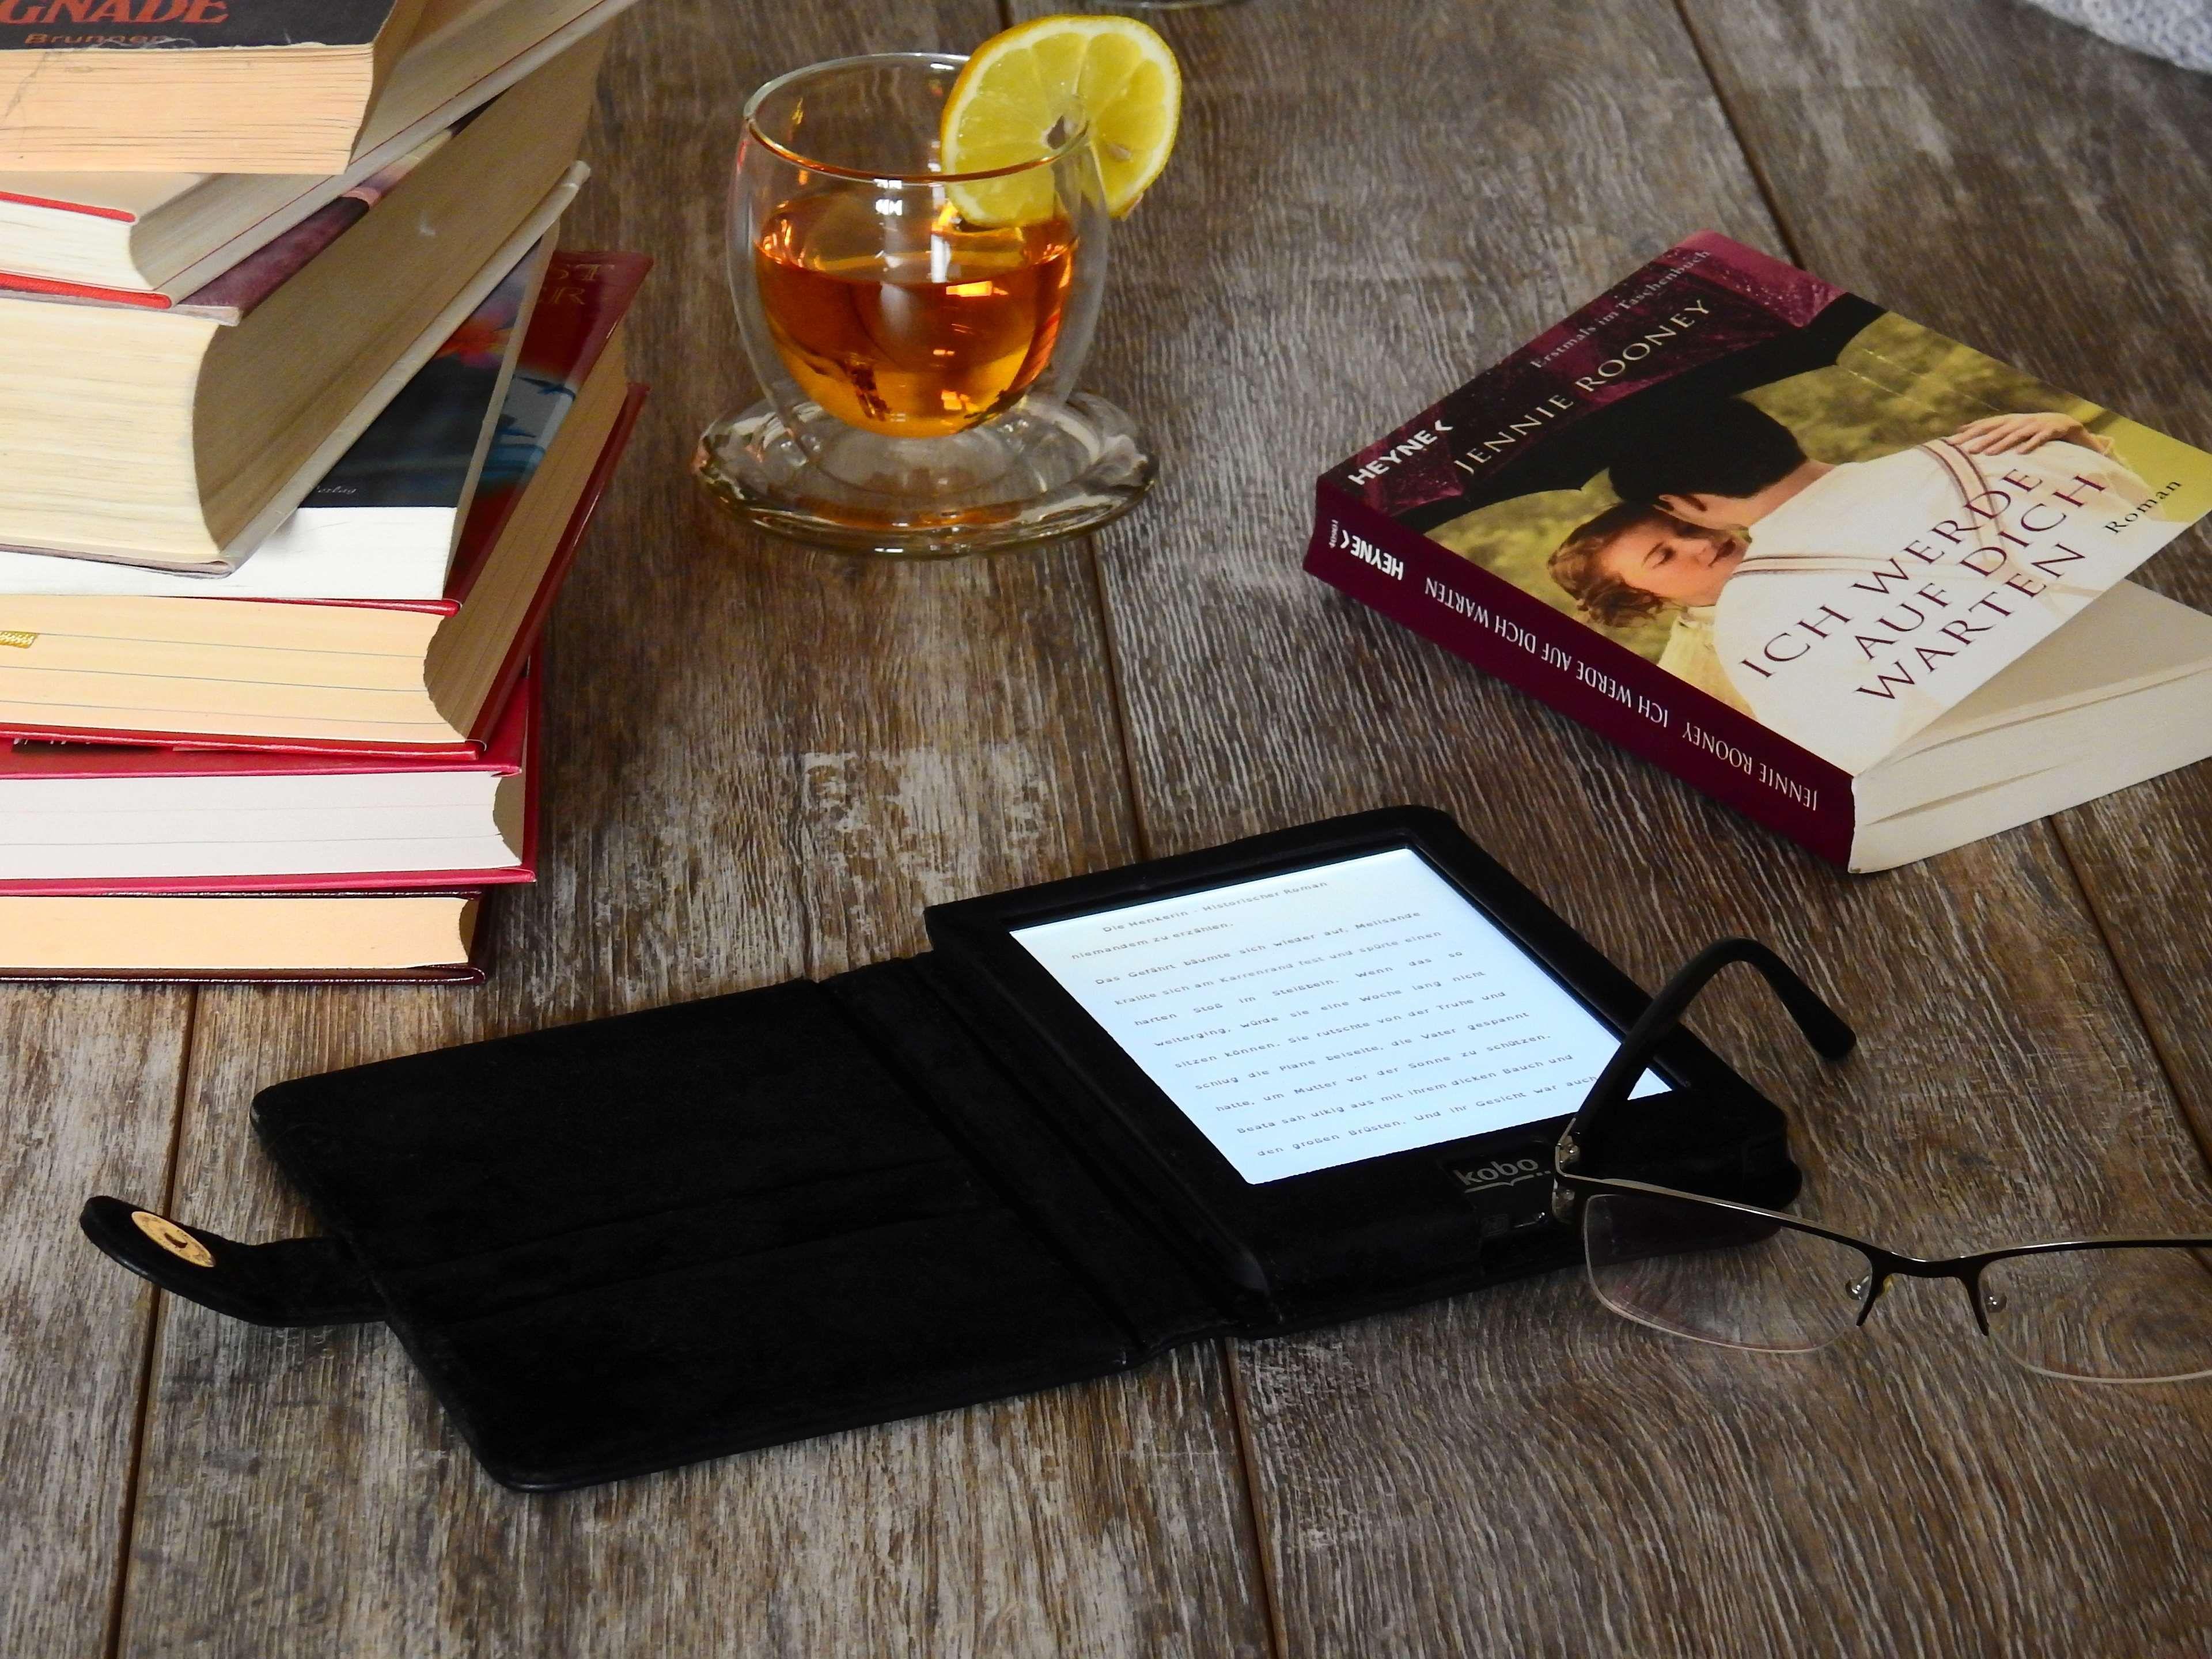 Book Digital Drink E Reader Font Glass Glasses Kindle Kobo Learn Literature Page Paper Read Reader Techn Ebook Deals Kobo Ereader Amazon Kindle